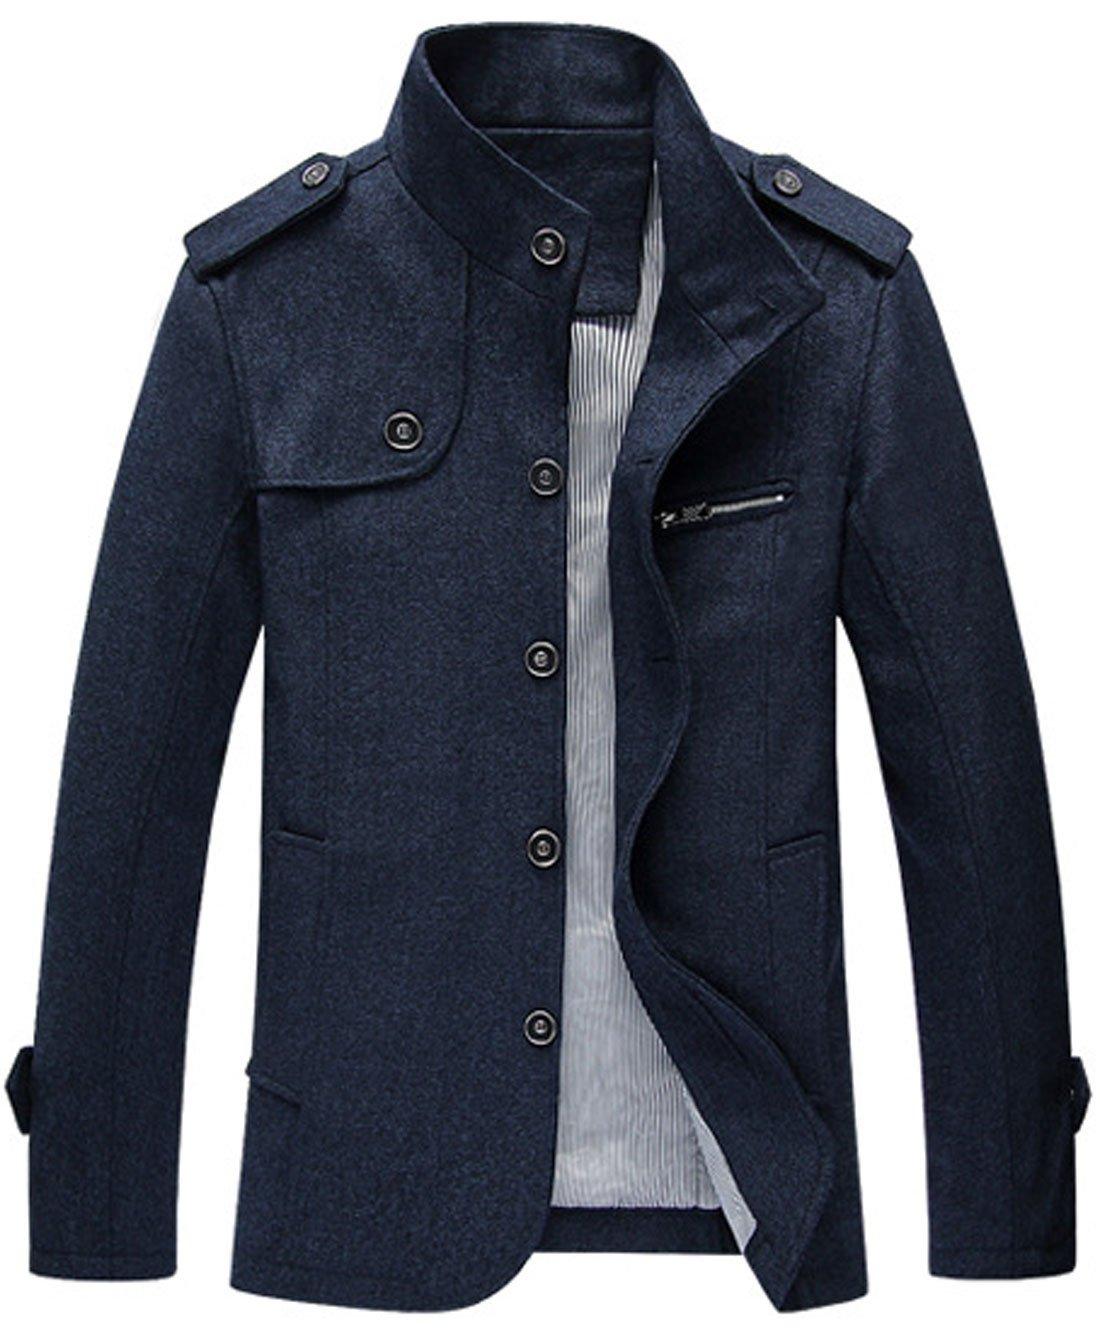 Chouyatou Men's Military Stylish Single Breasted Natural Fit Stripe Lined Wool Pea Coats (Medium, Dark Blue)